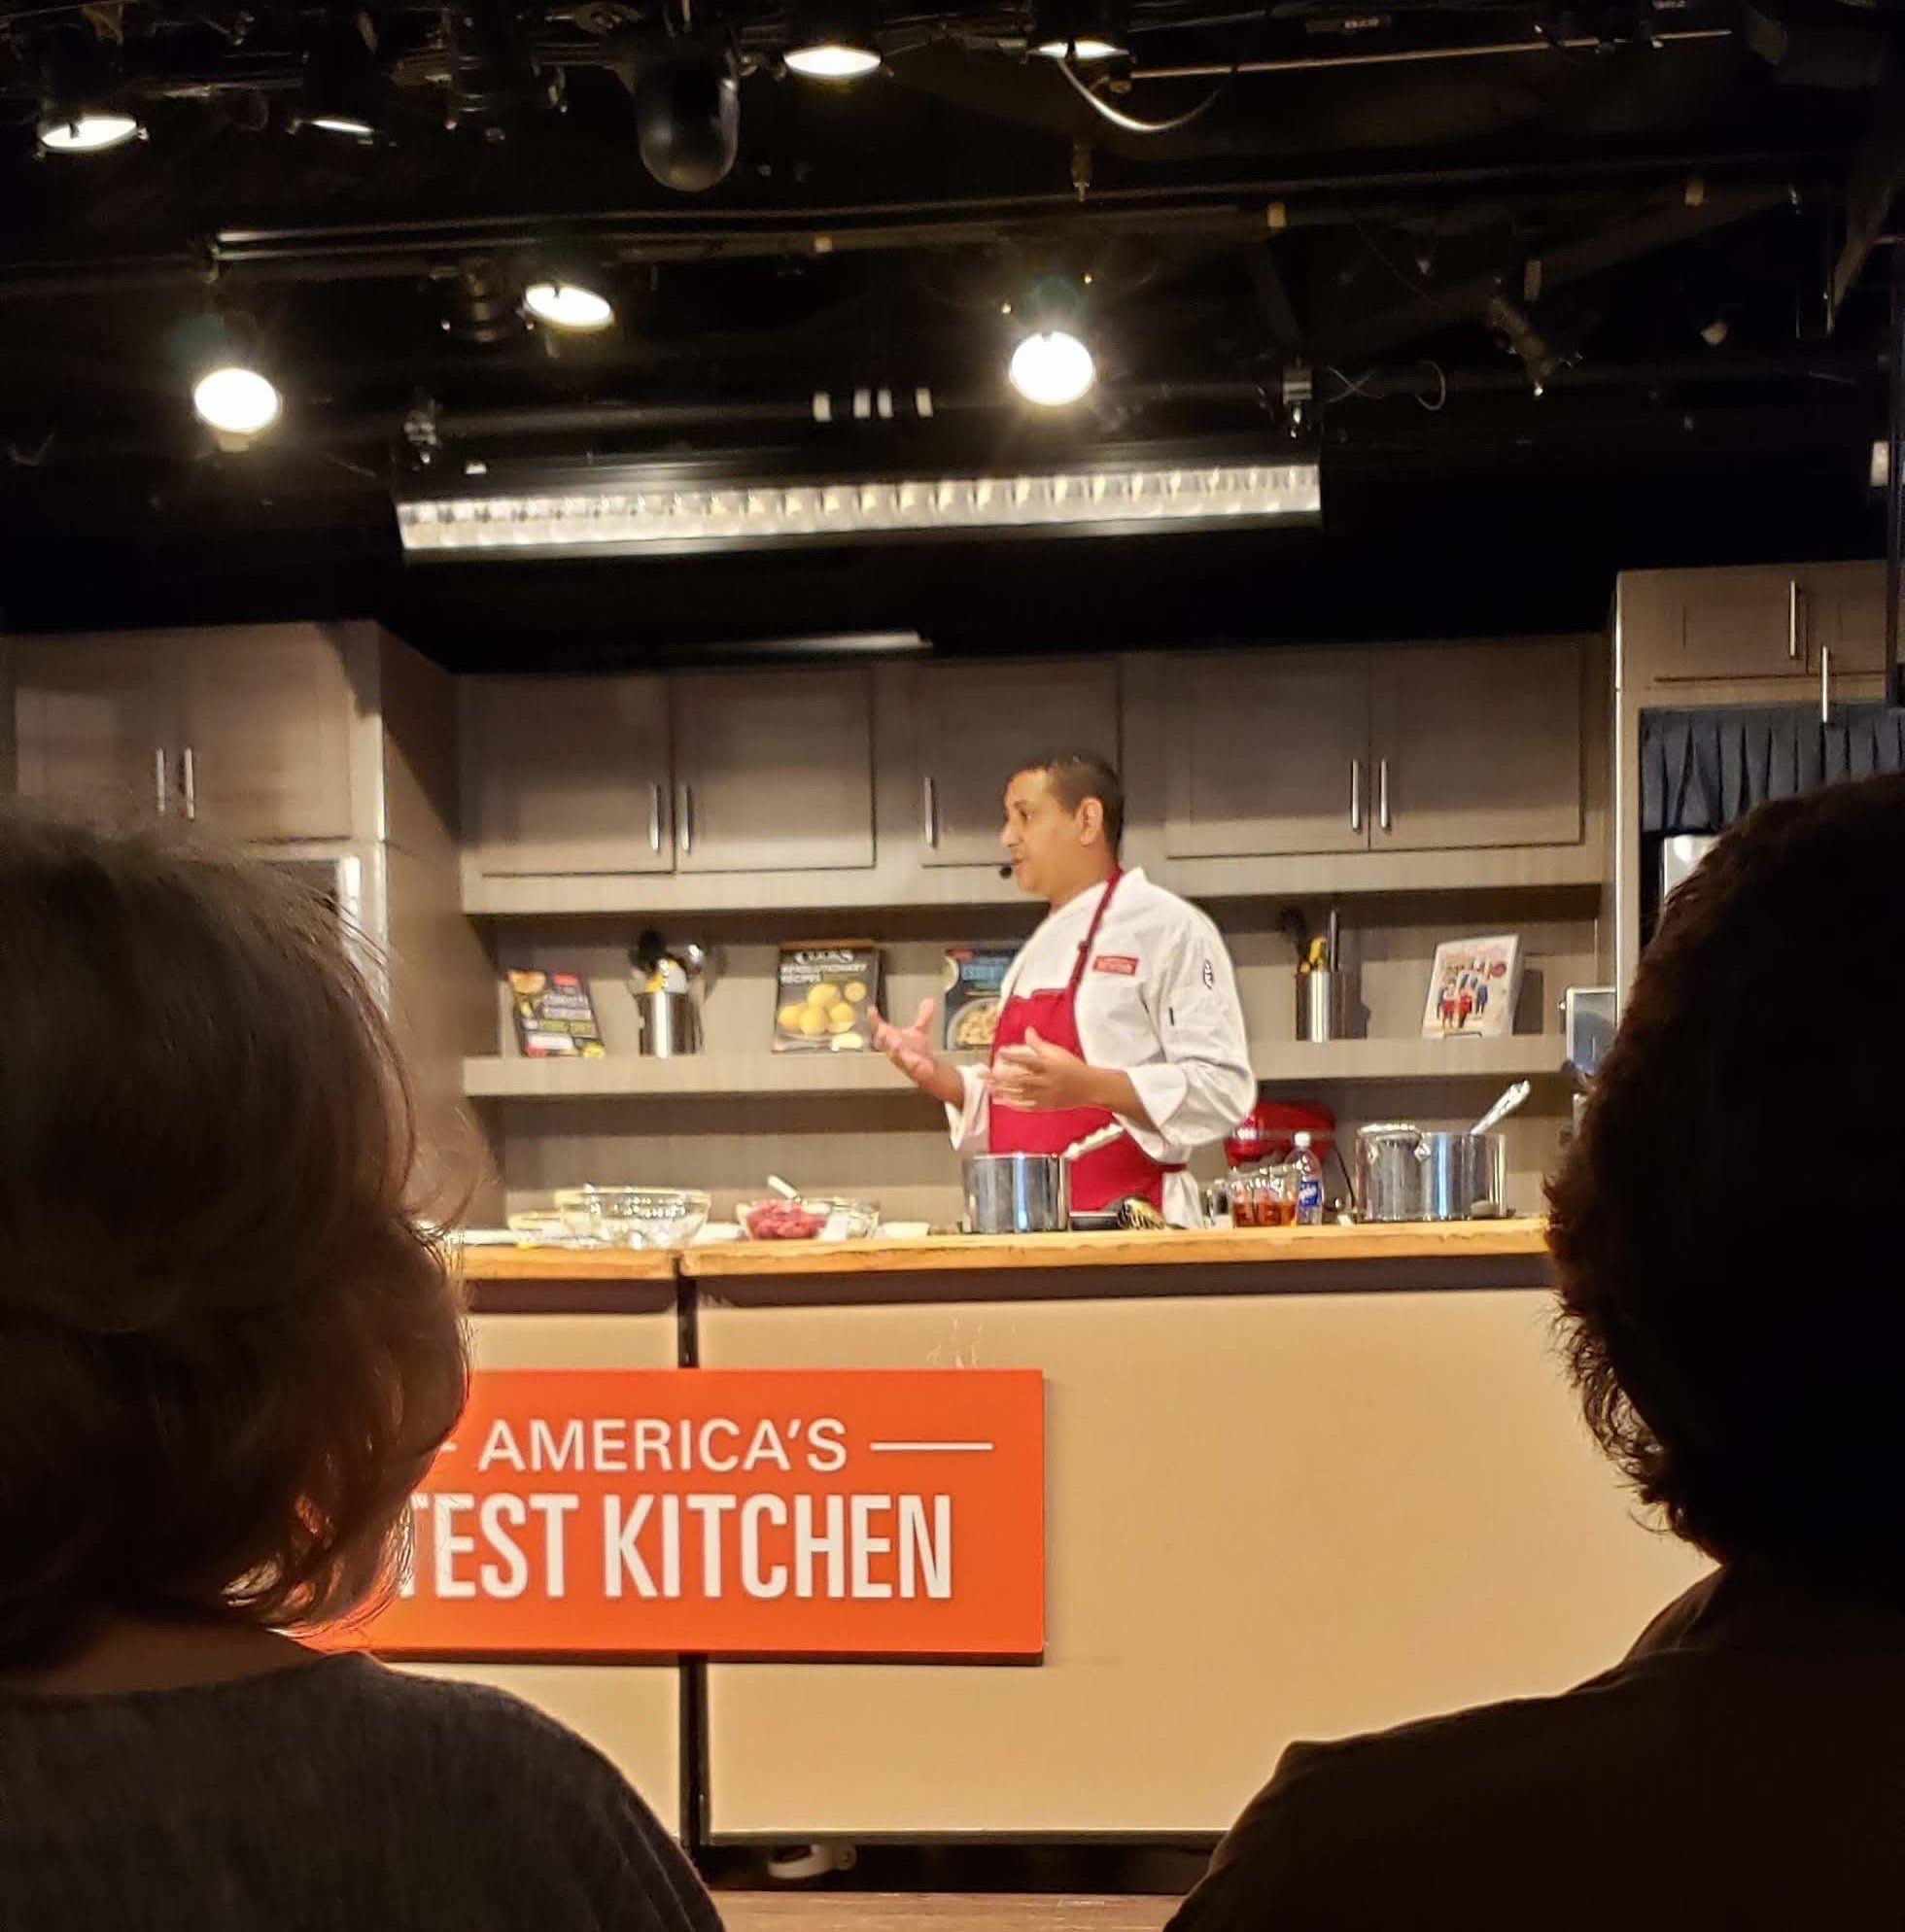 HALのお料理ショー:「America's Test Kitchen」